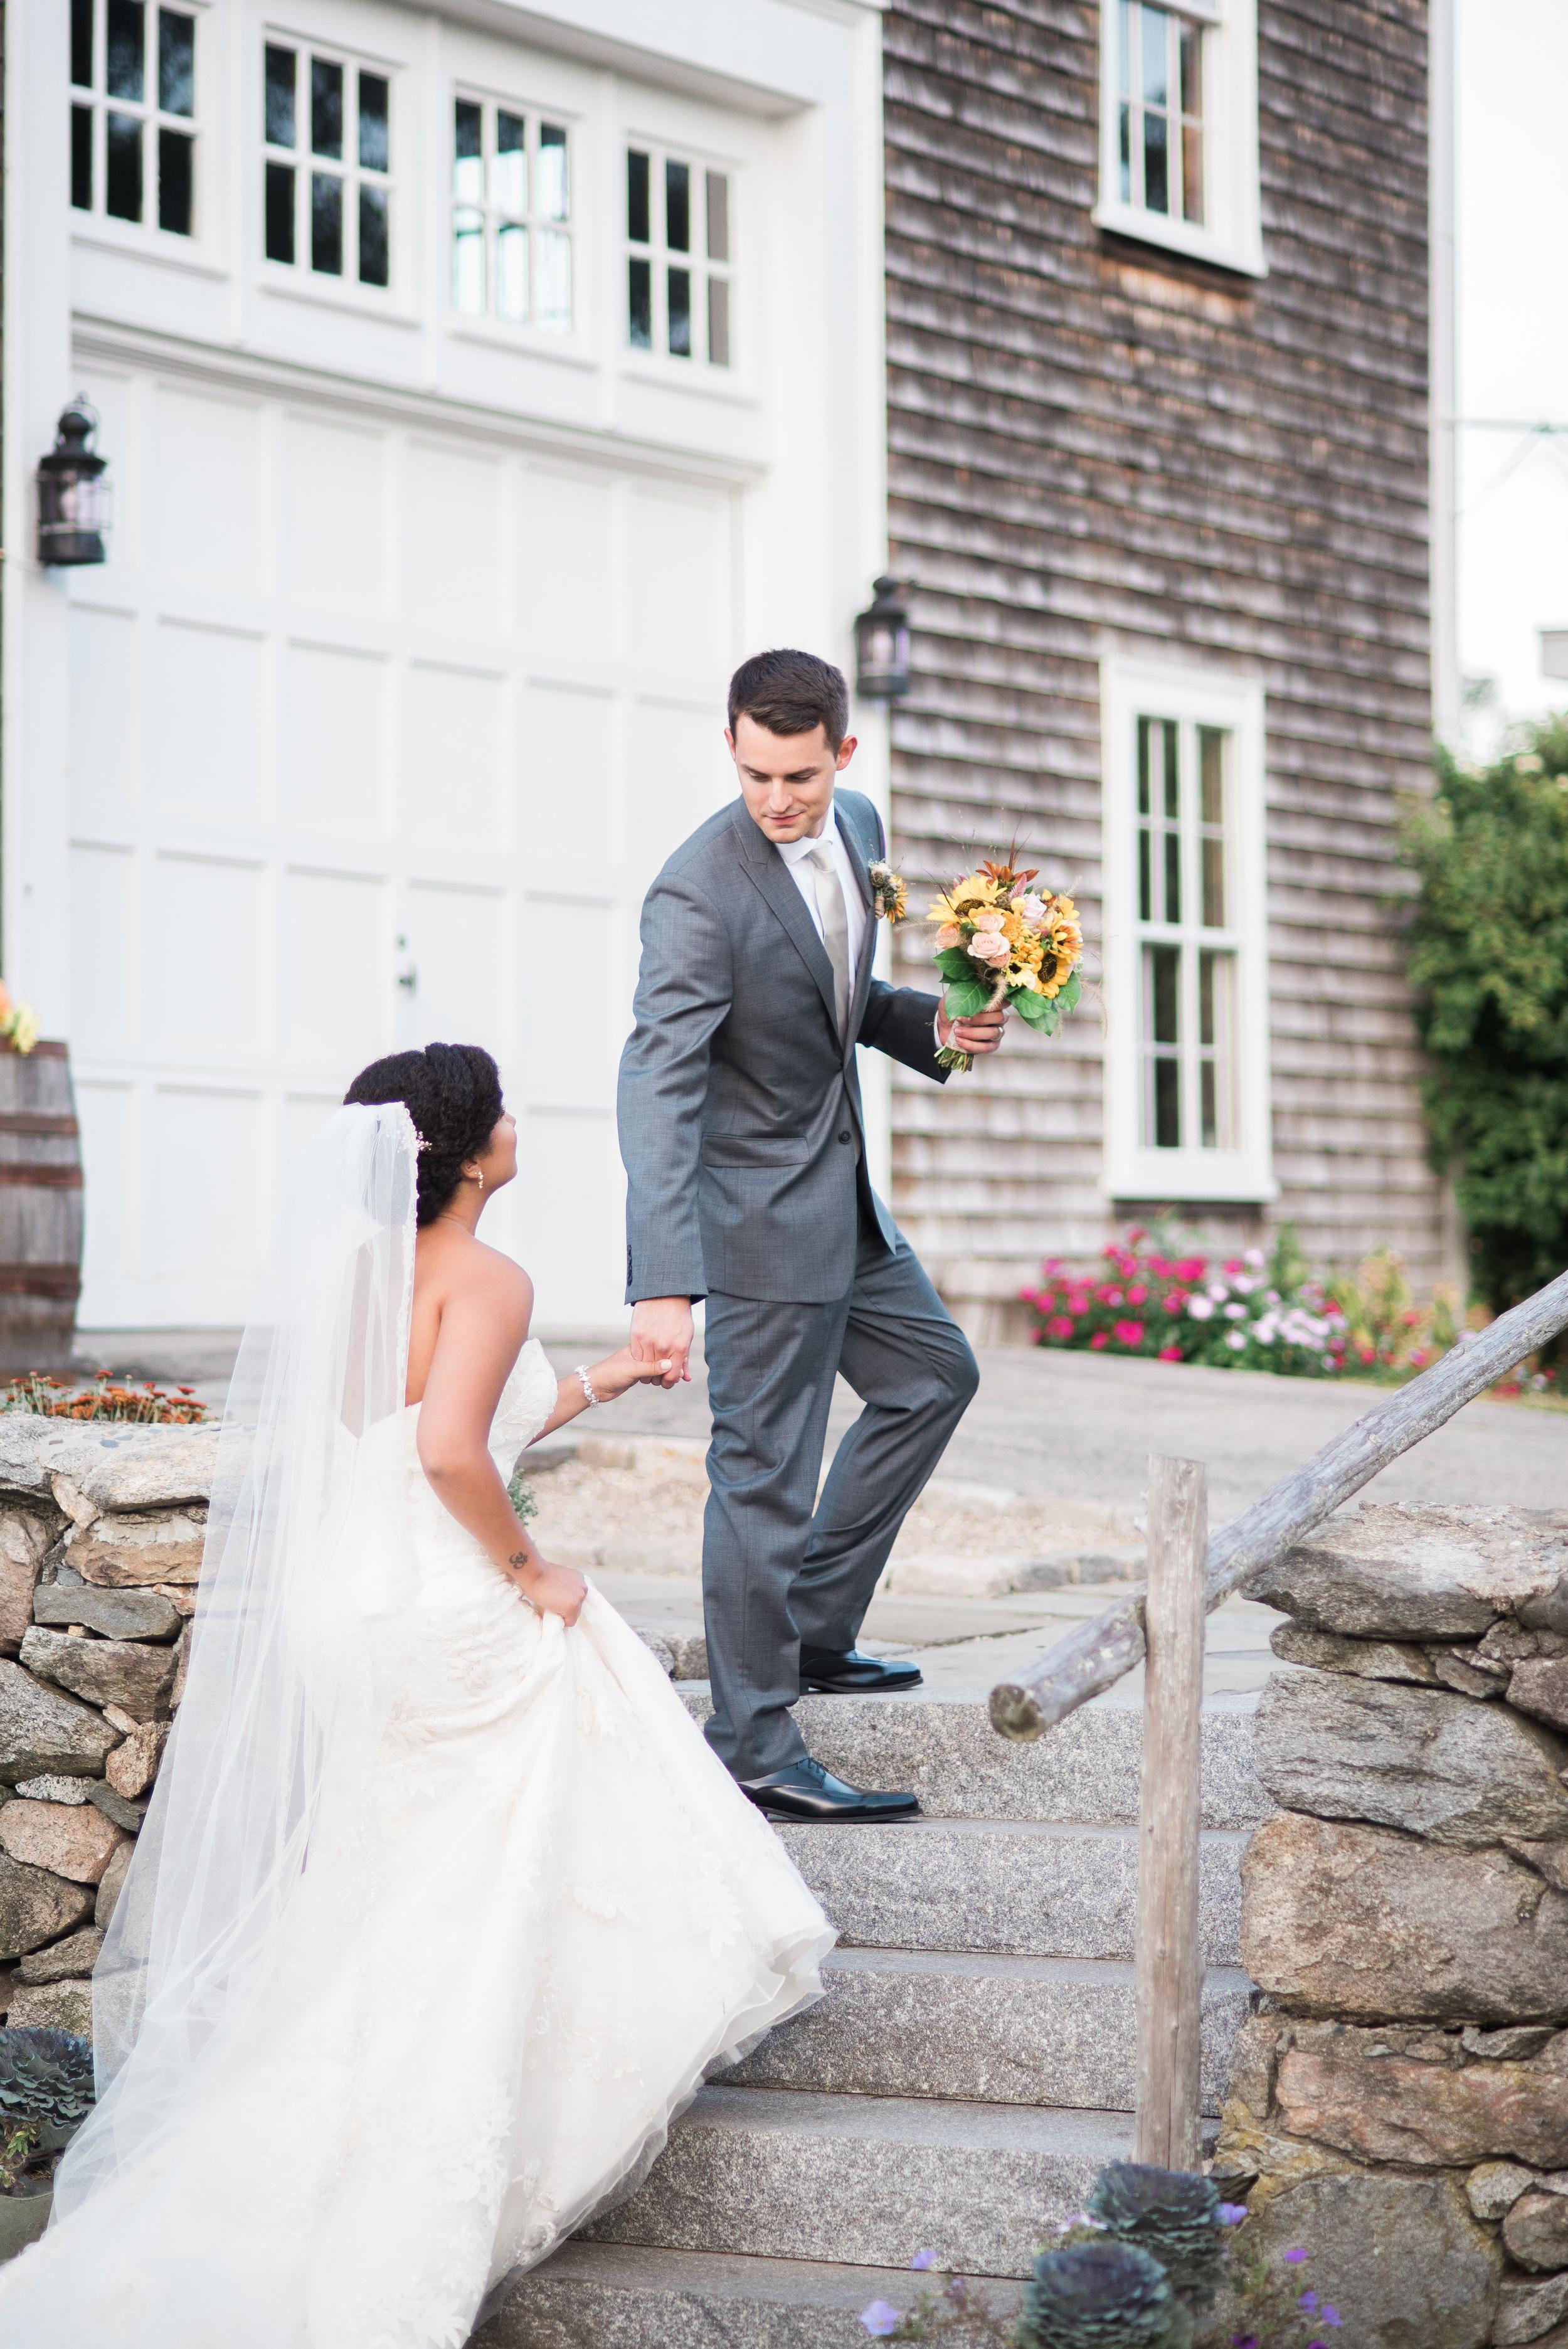 house of lubold photograph weddings-14.jpg